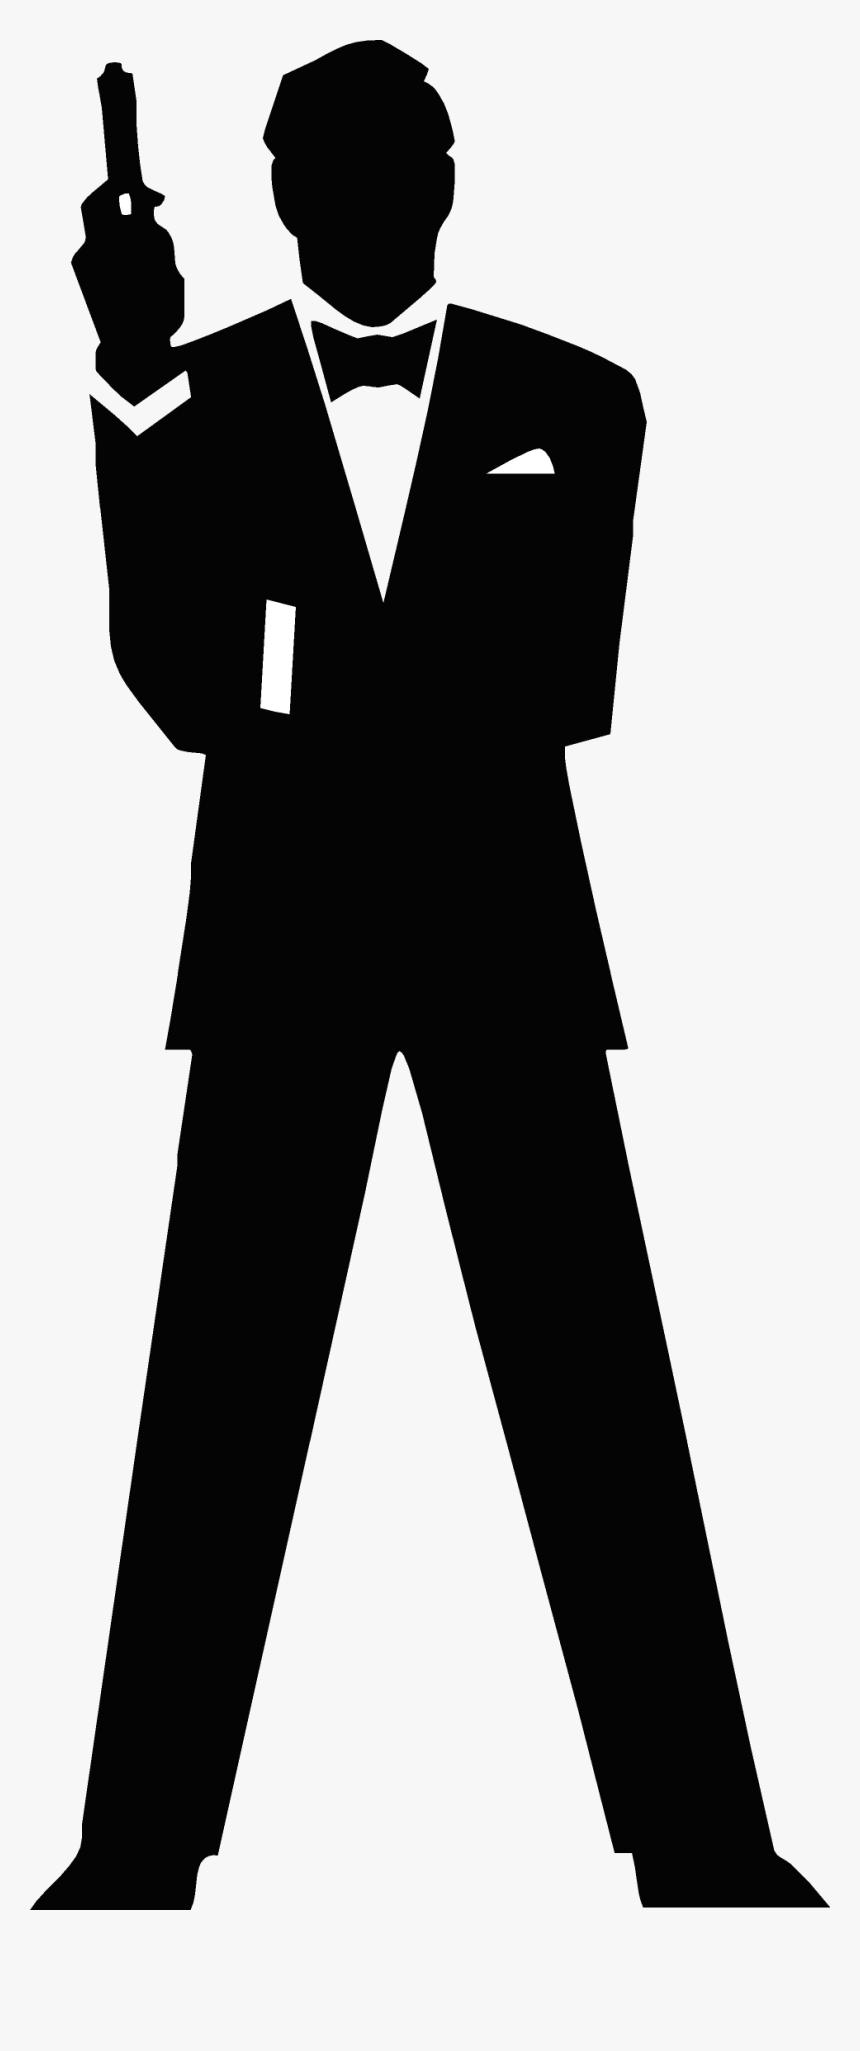 Clip Art James Bond Silhouette Clip Art - Sticker James Bond, HD Png Download, Free Download